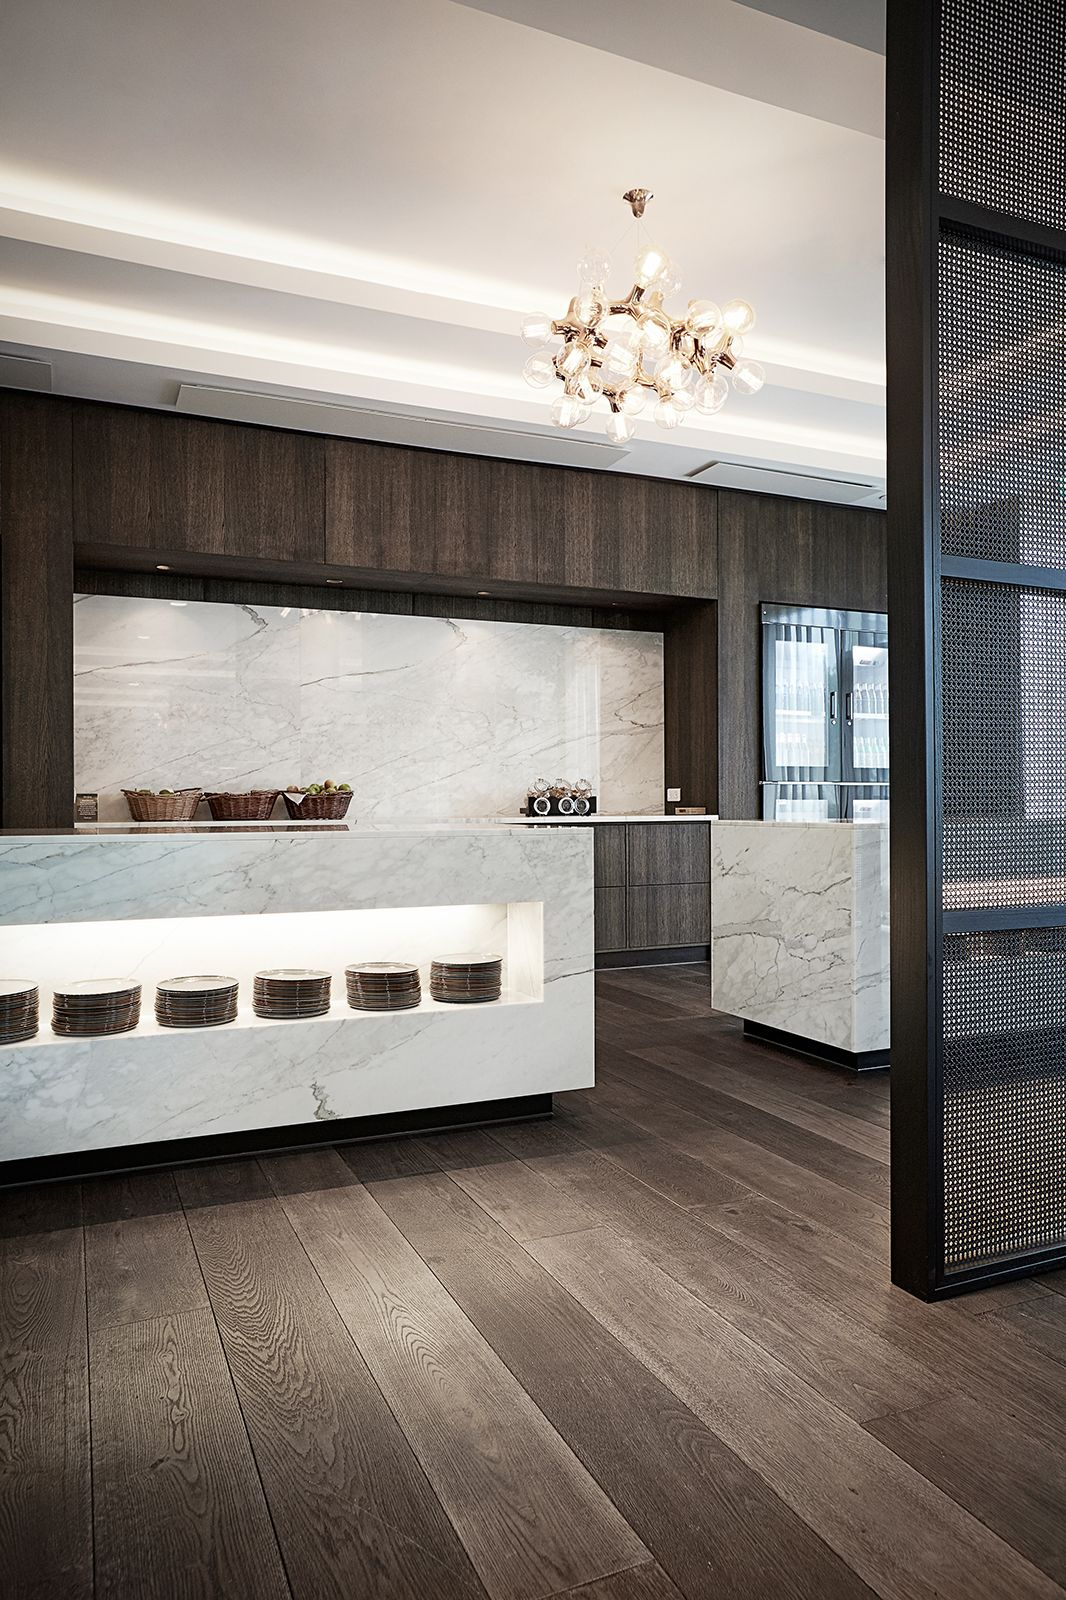 marriott copenhagen executive lounge interior design by helle flou function roompalm desertdesign - Interior Design Palm Desert